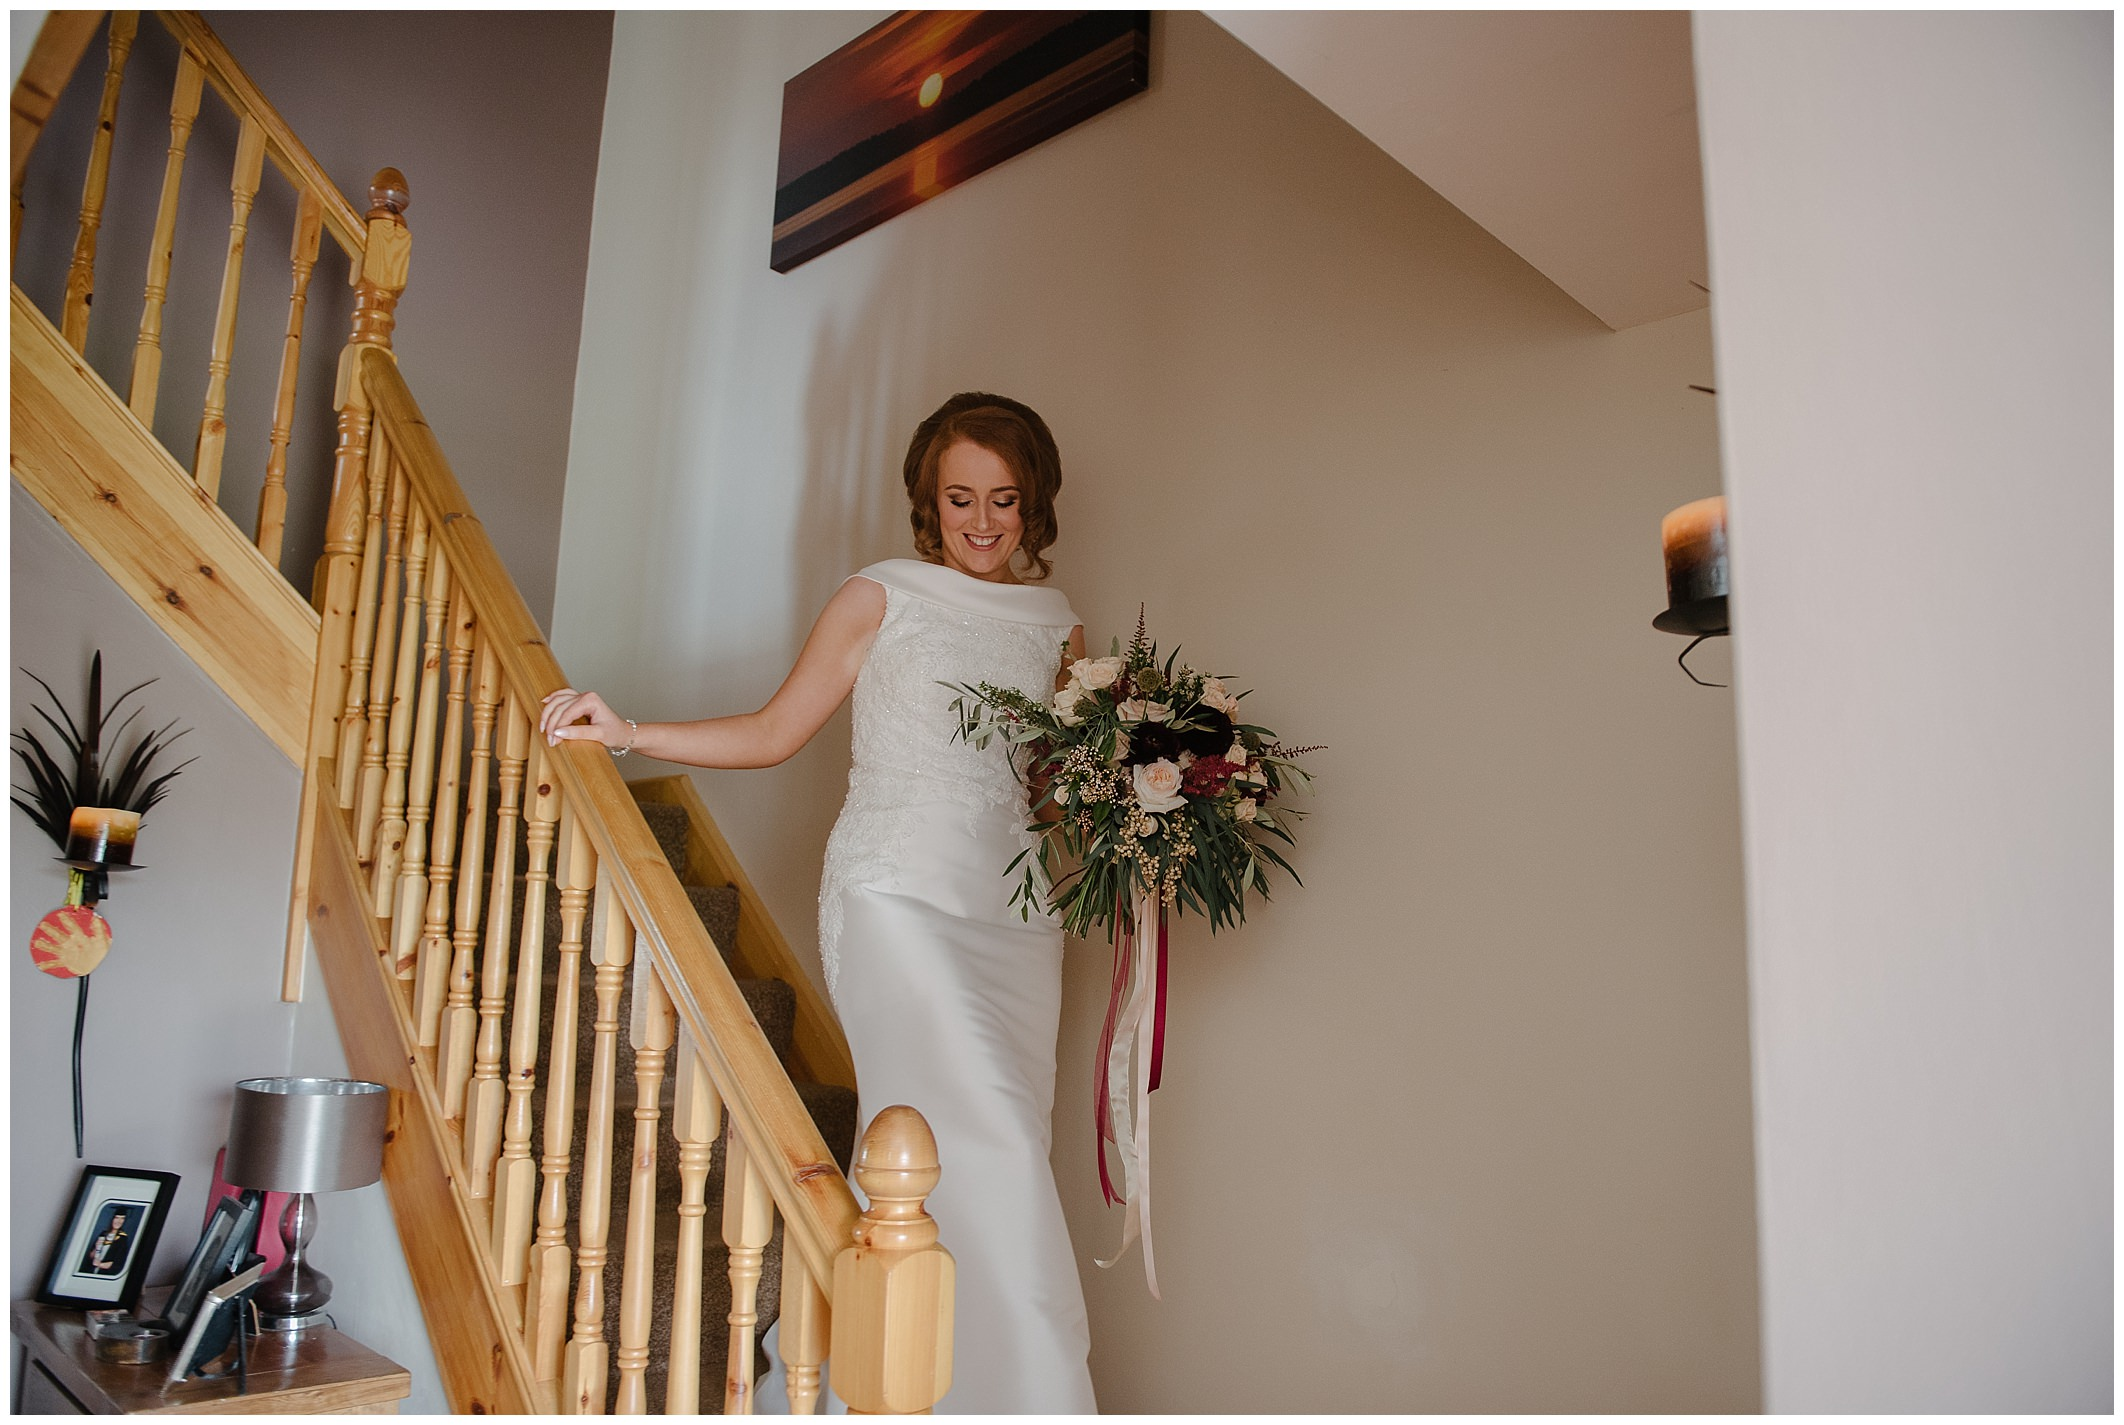 corick-house-wedding-hannah-gary-jude-browne-photography_0017.jpg